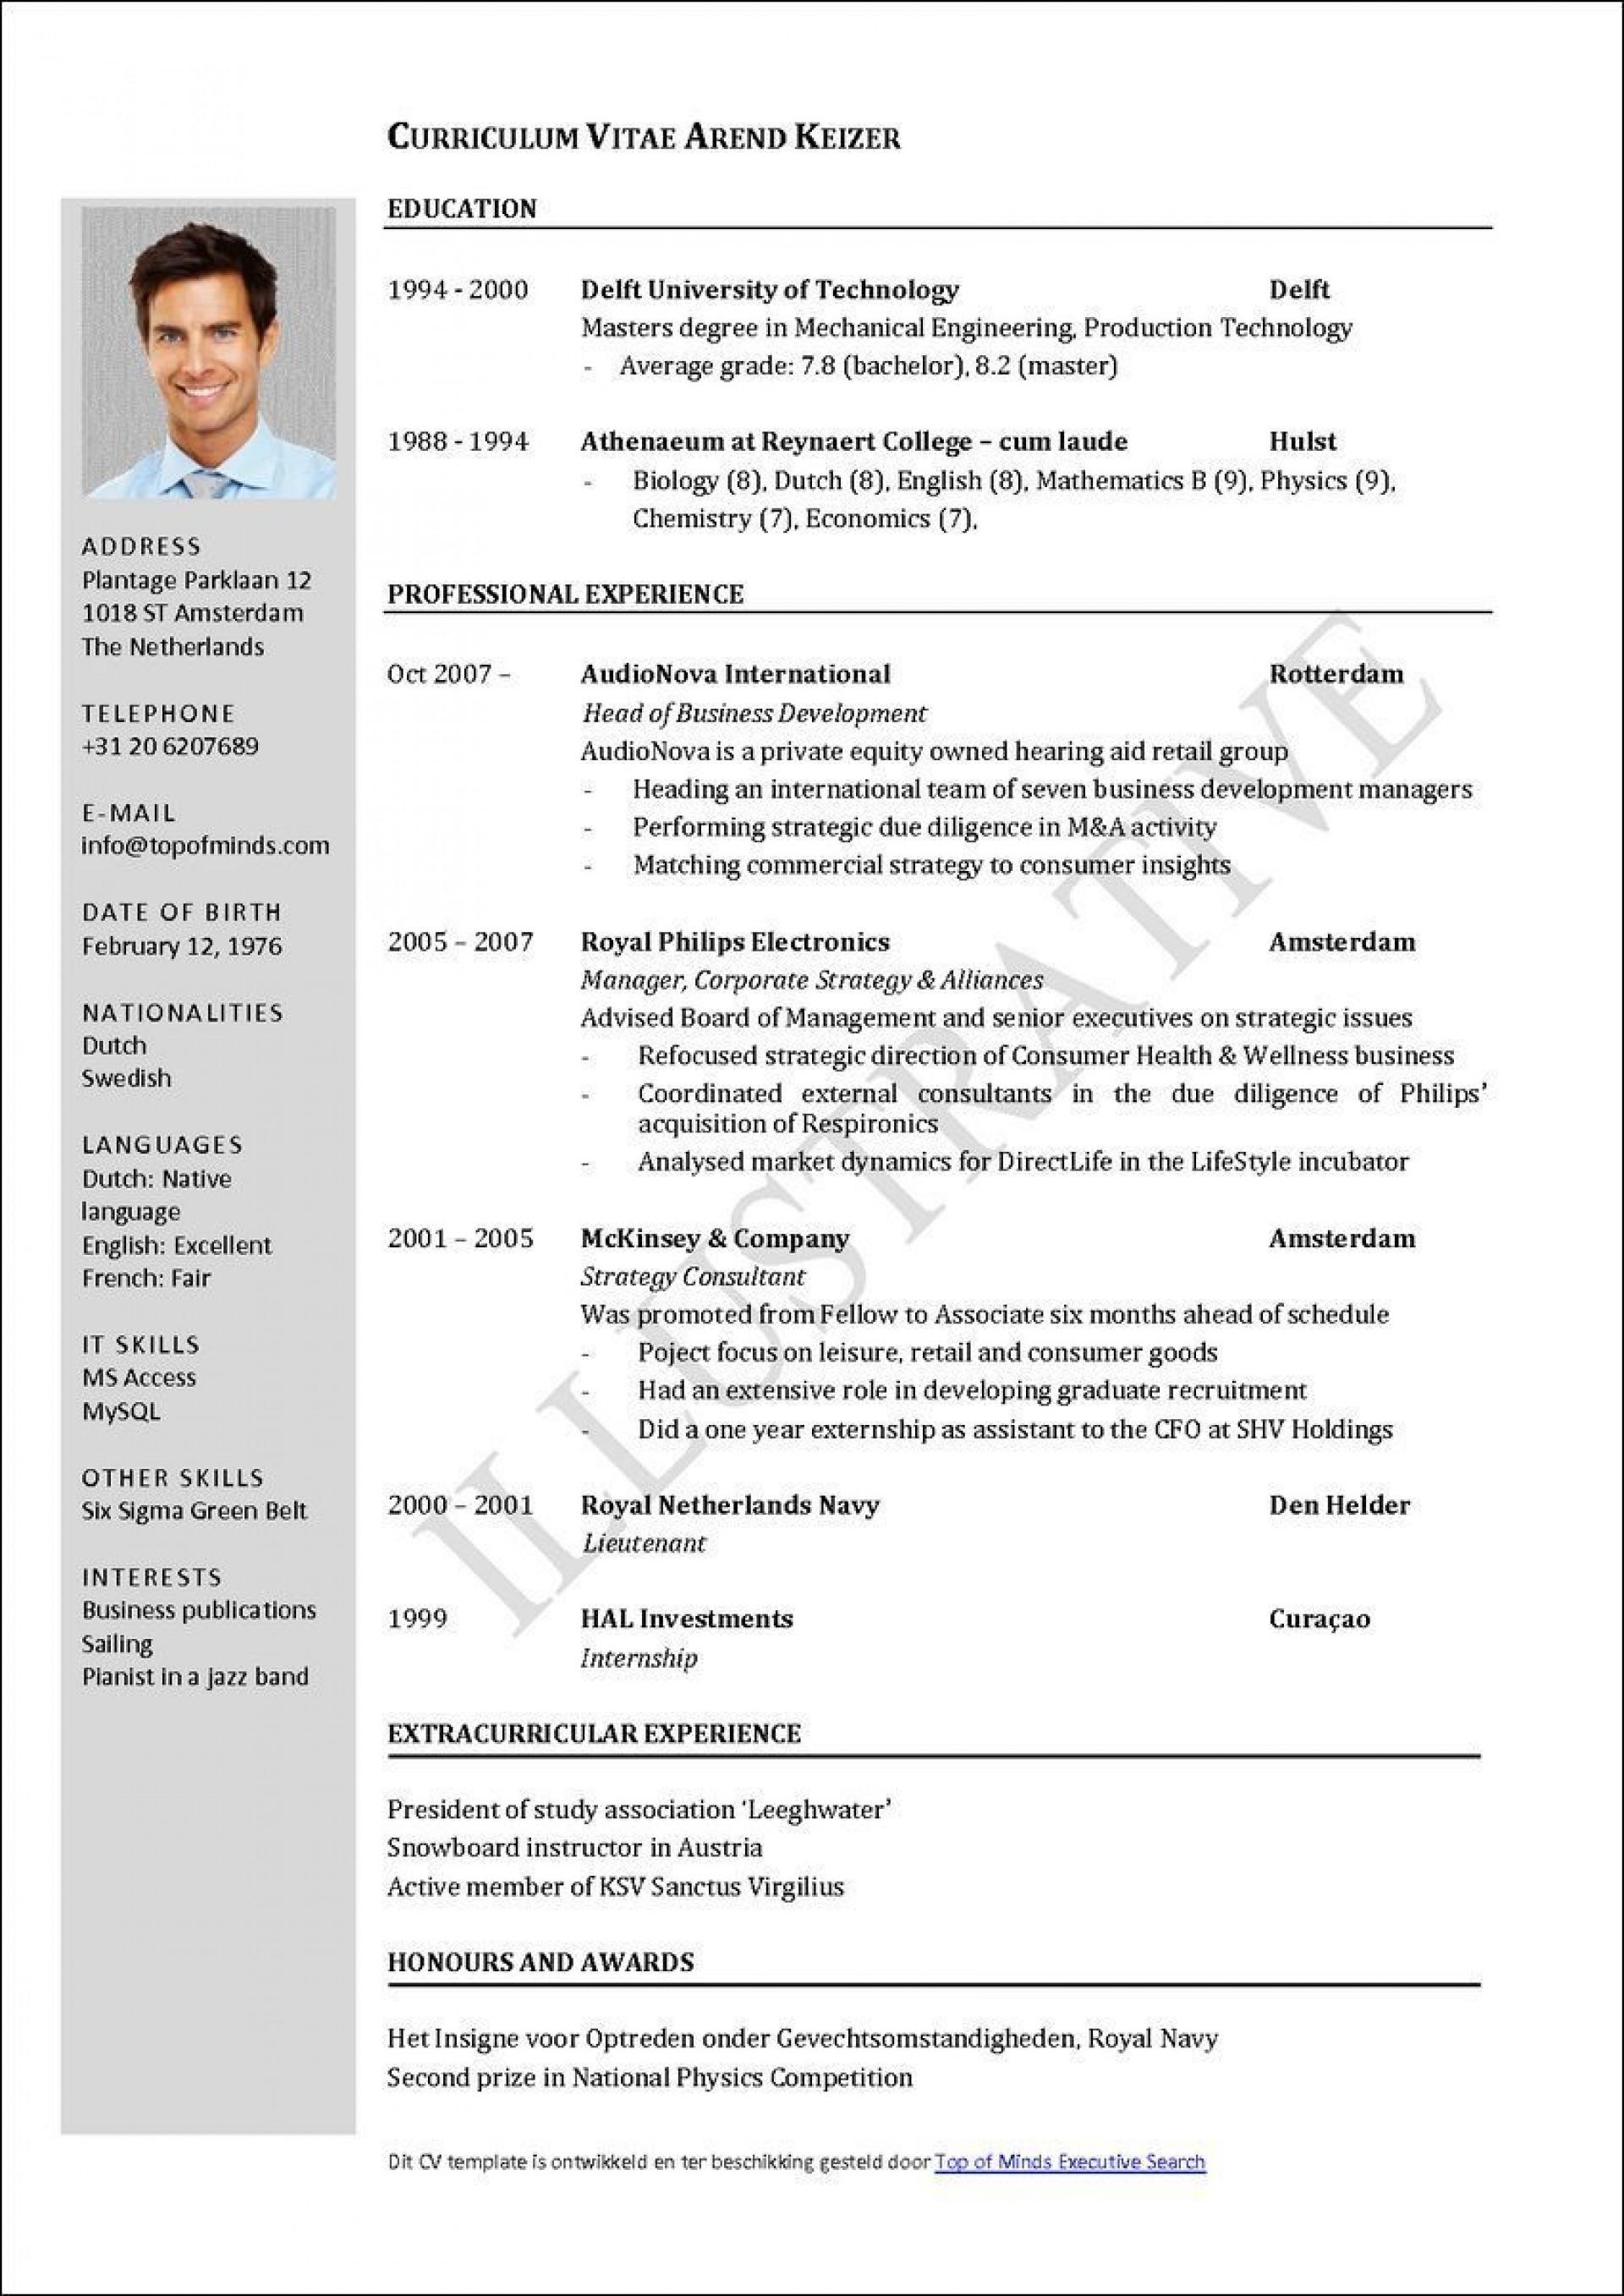 004 Unforgettable Curriculum Vitae Template Free Word Sample  Format Microsoft Cv Download1920